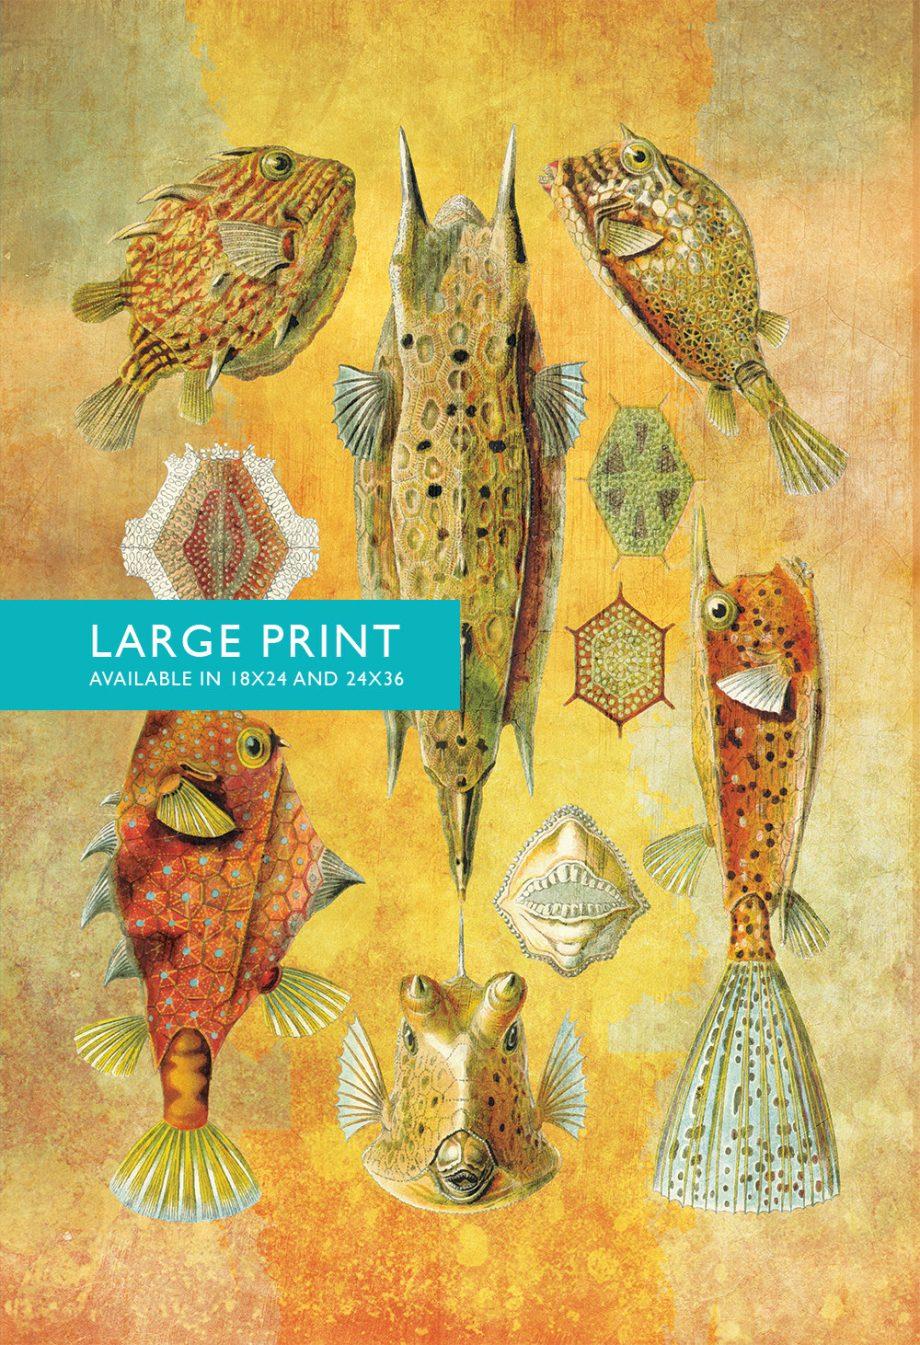 Ernst Haeckel Ostraciontes Print Boxfish Art Vintage Nautical Decor Ocean Wall Art - Giclee Print on Canvas & Satin